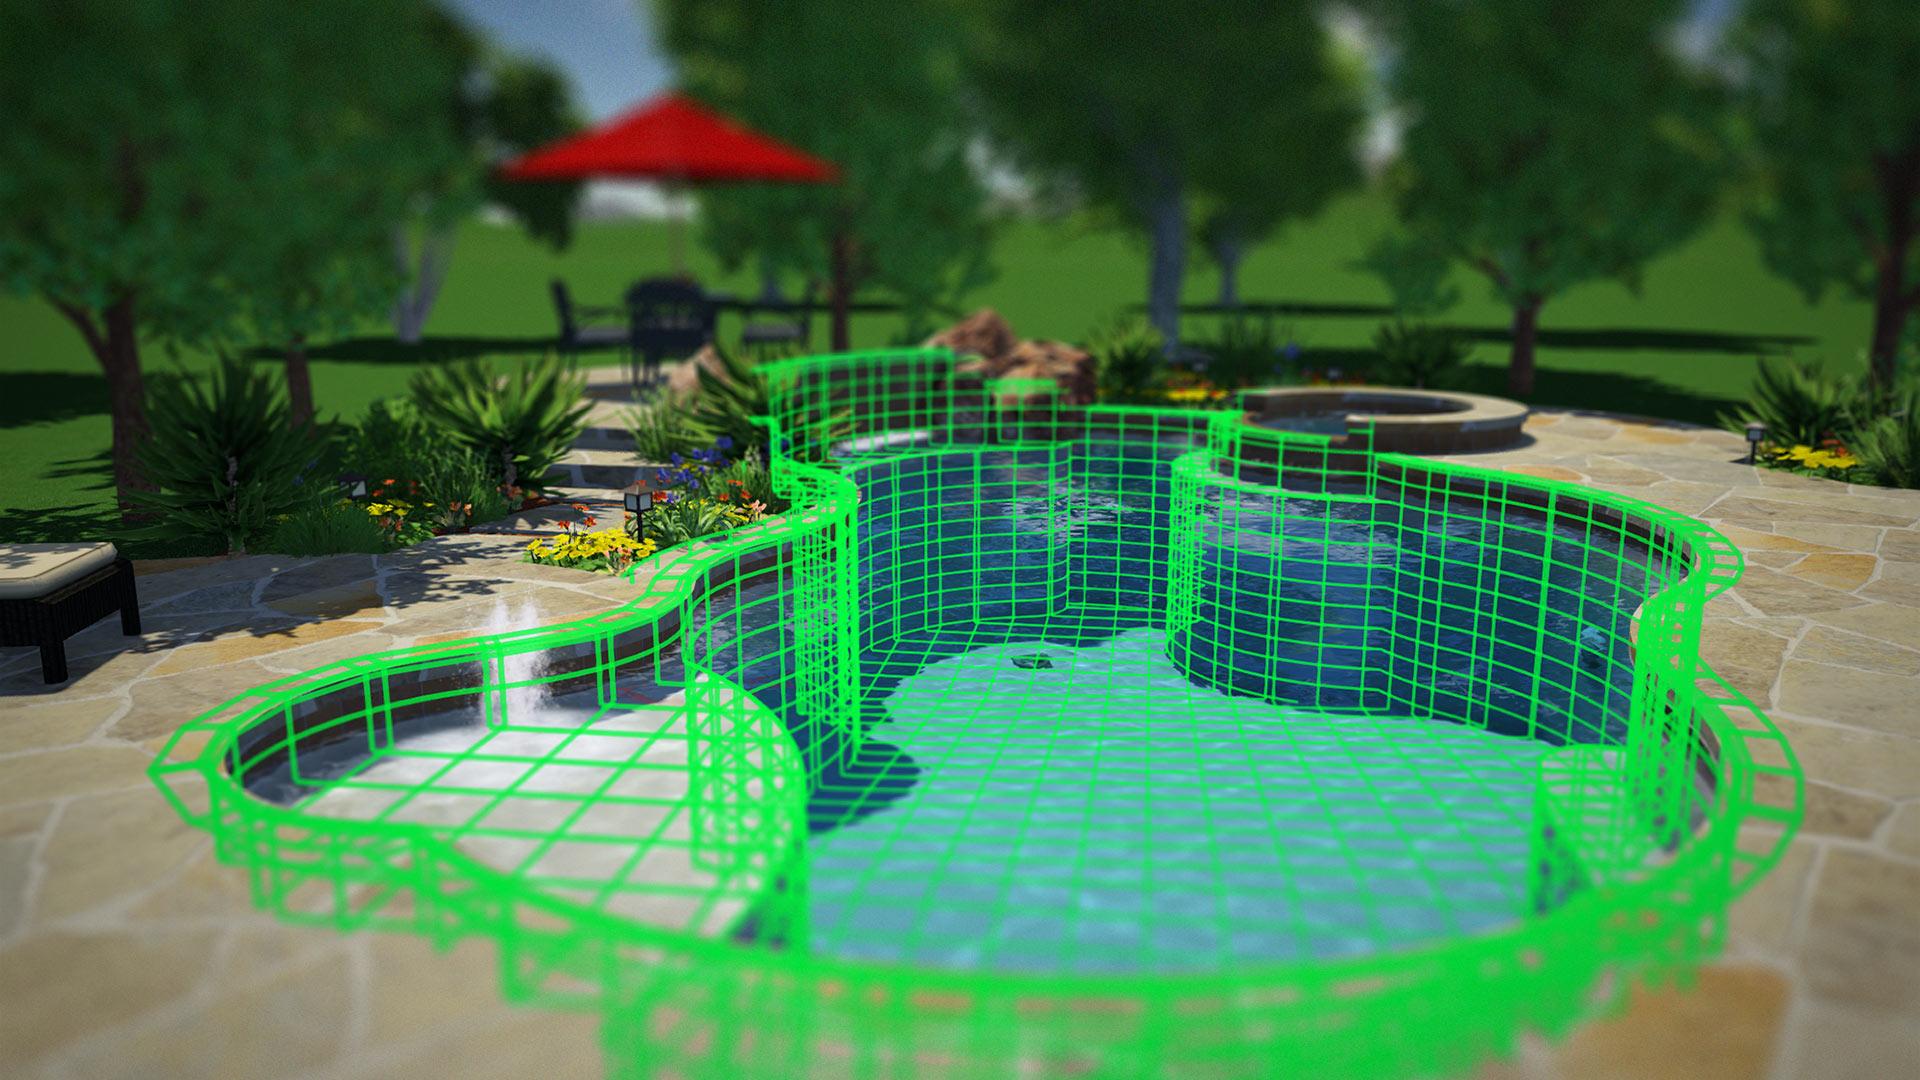 Construction planning software outdoor living design for Pool design software